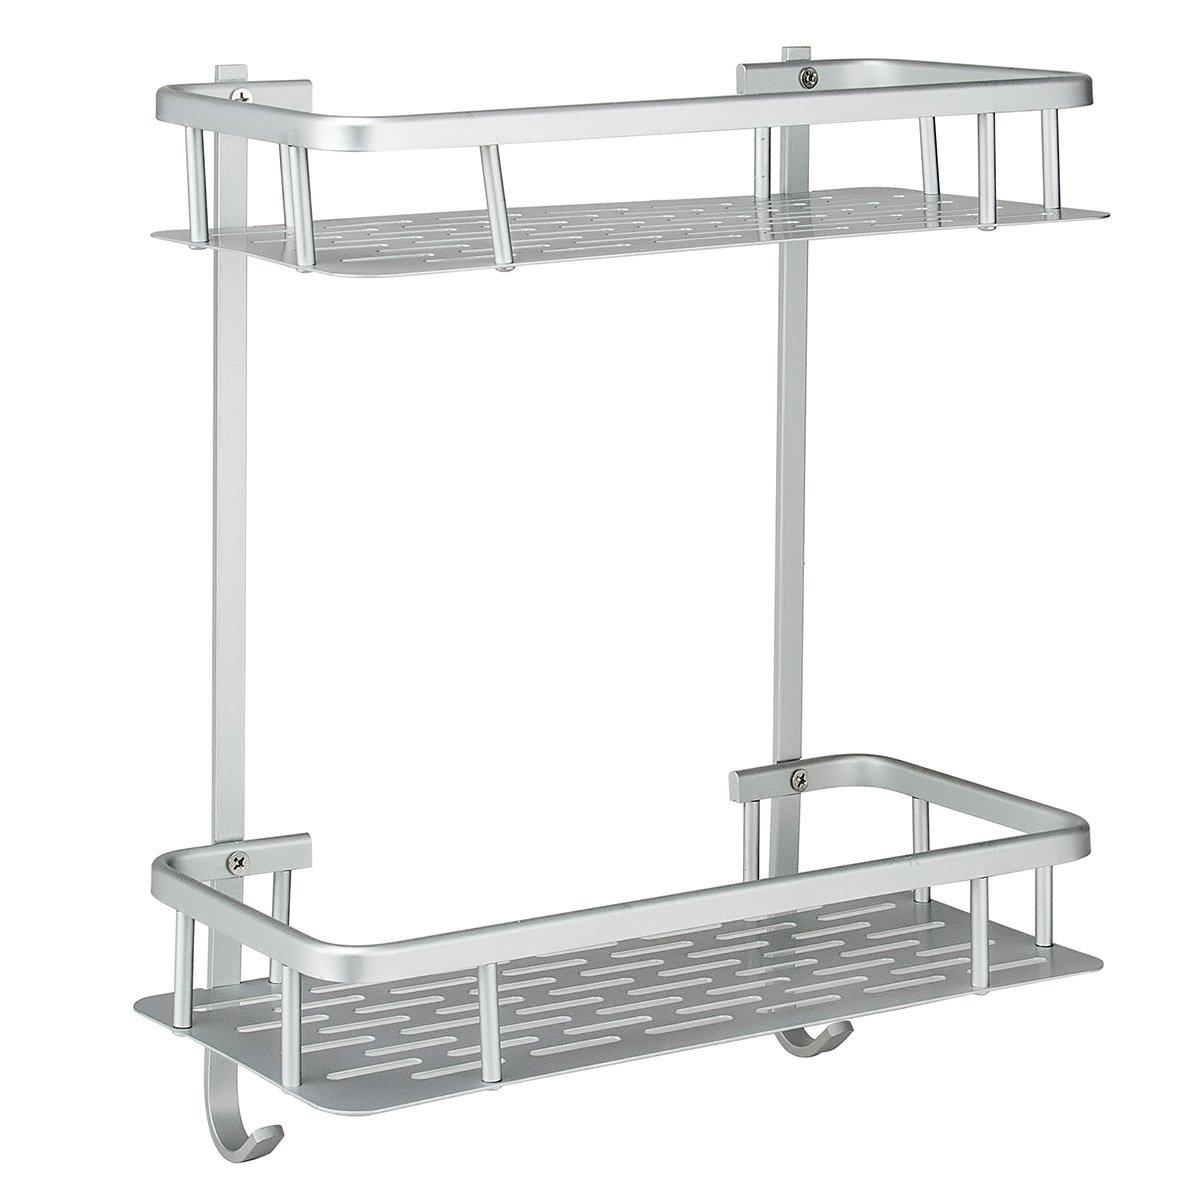 Deekec Shelf (No Drilling) Durable Aluminum 2 Tiers Shower Storage Caddy Towel Bar Basket Kitchen Corner Sticky No Drills Shelves (Bathroom Shelf 2 Tiers-Rectangle)